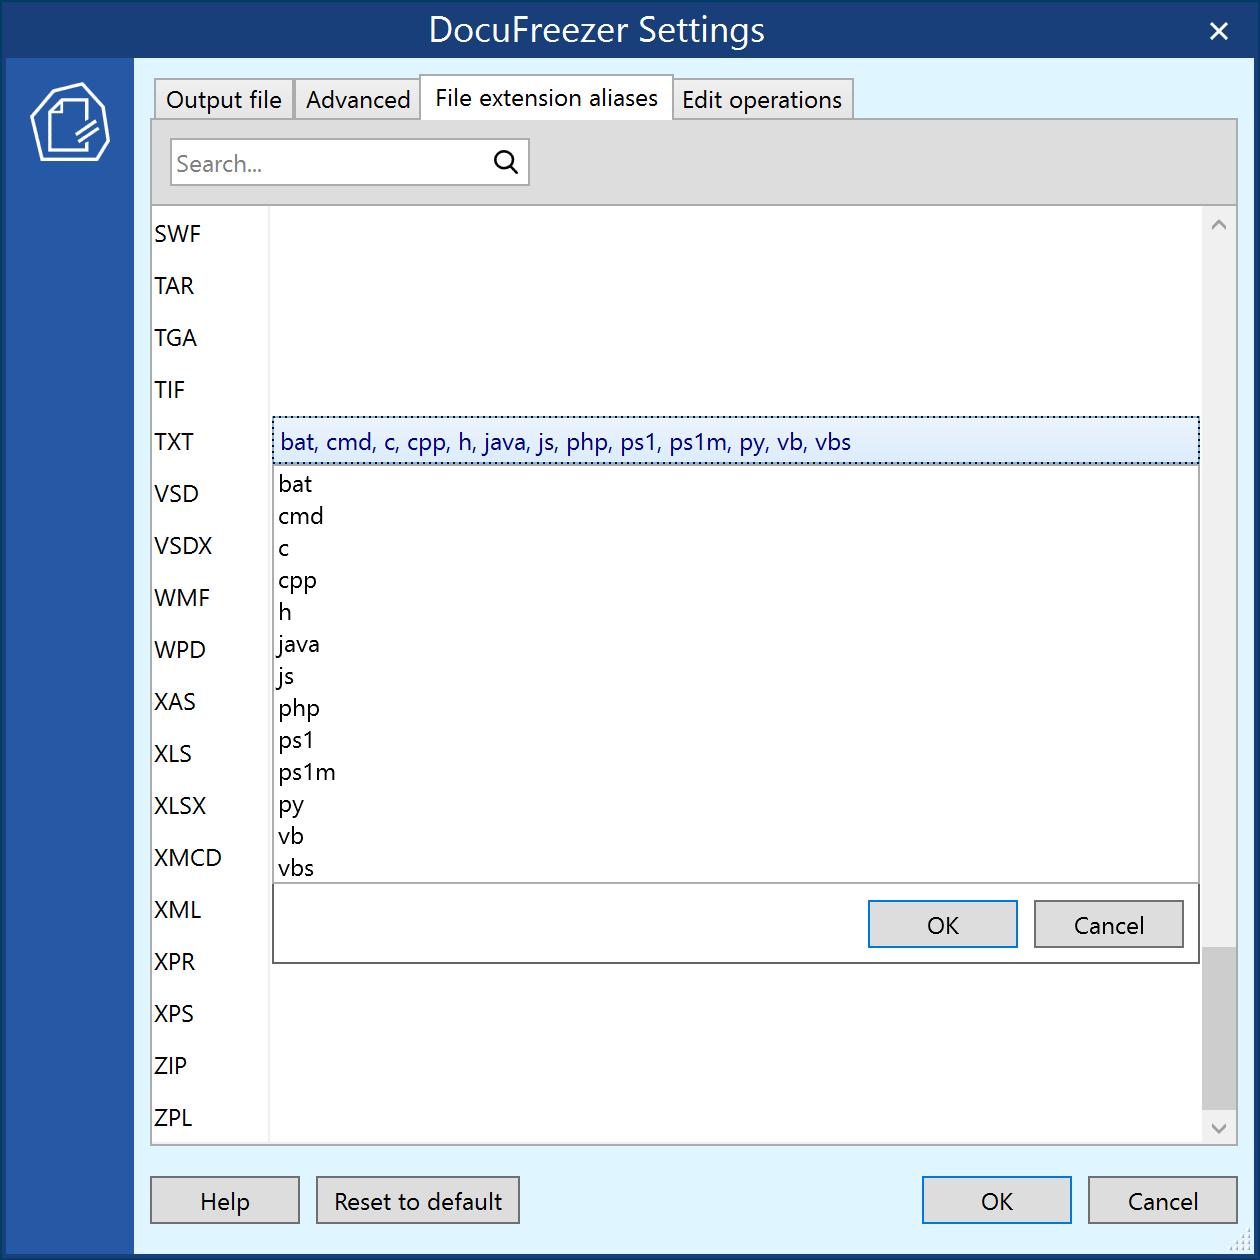 File extension aliases